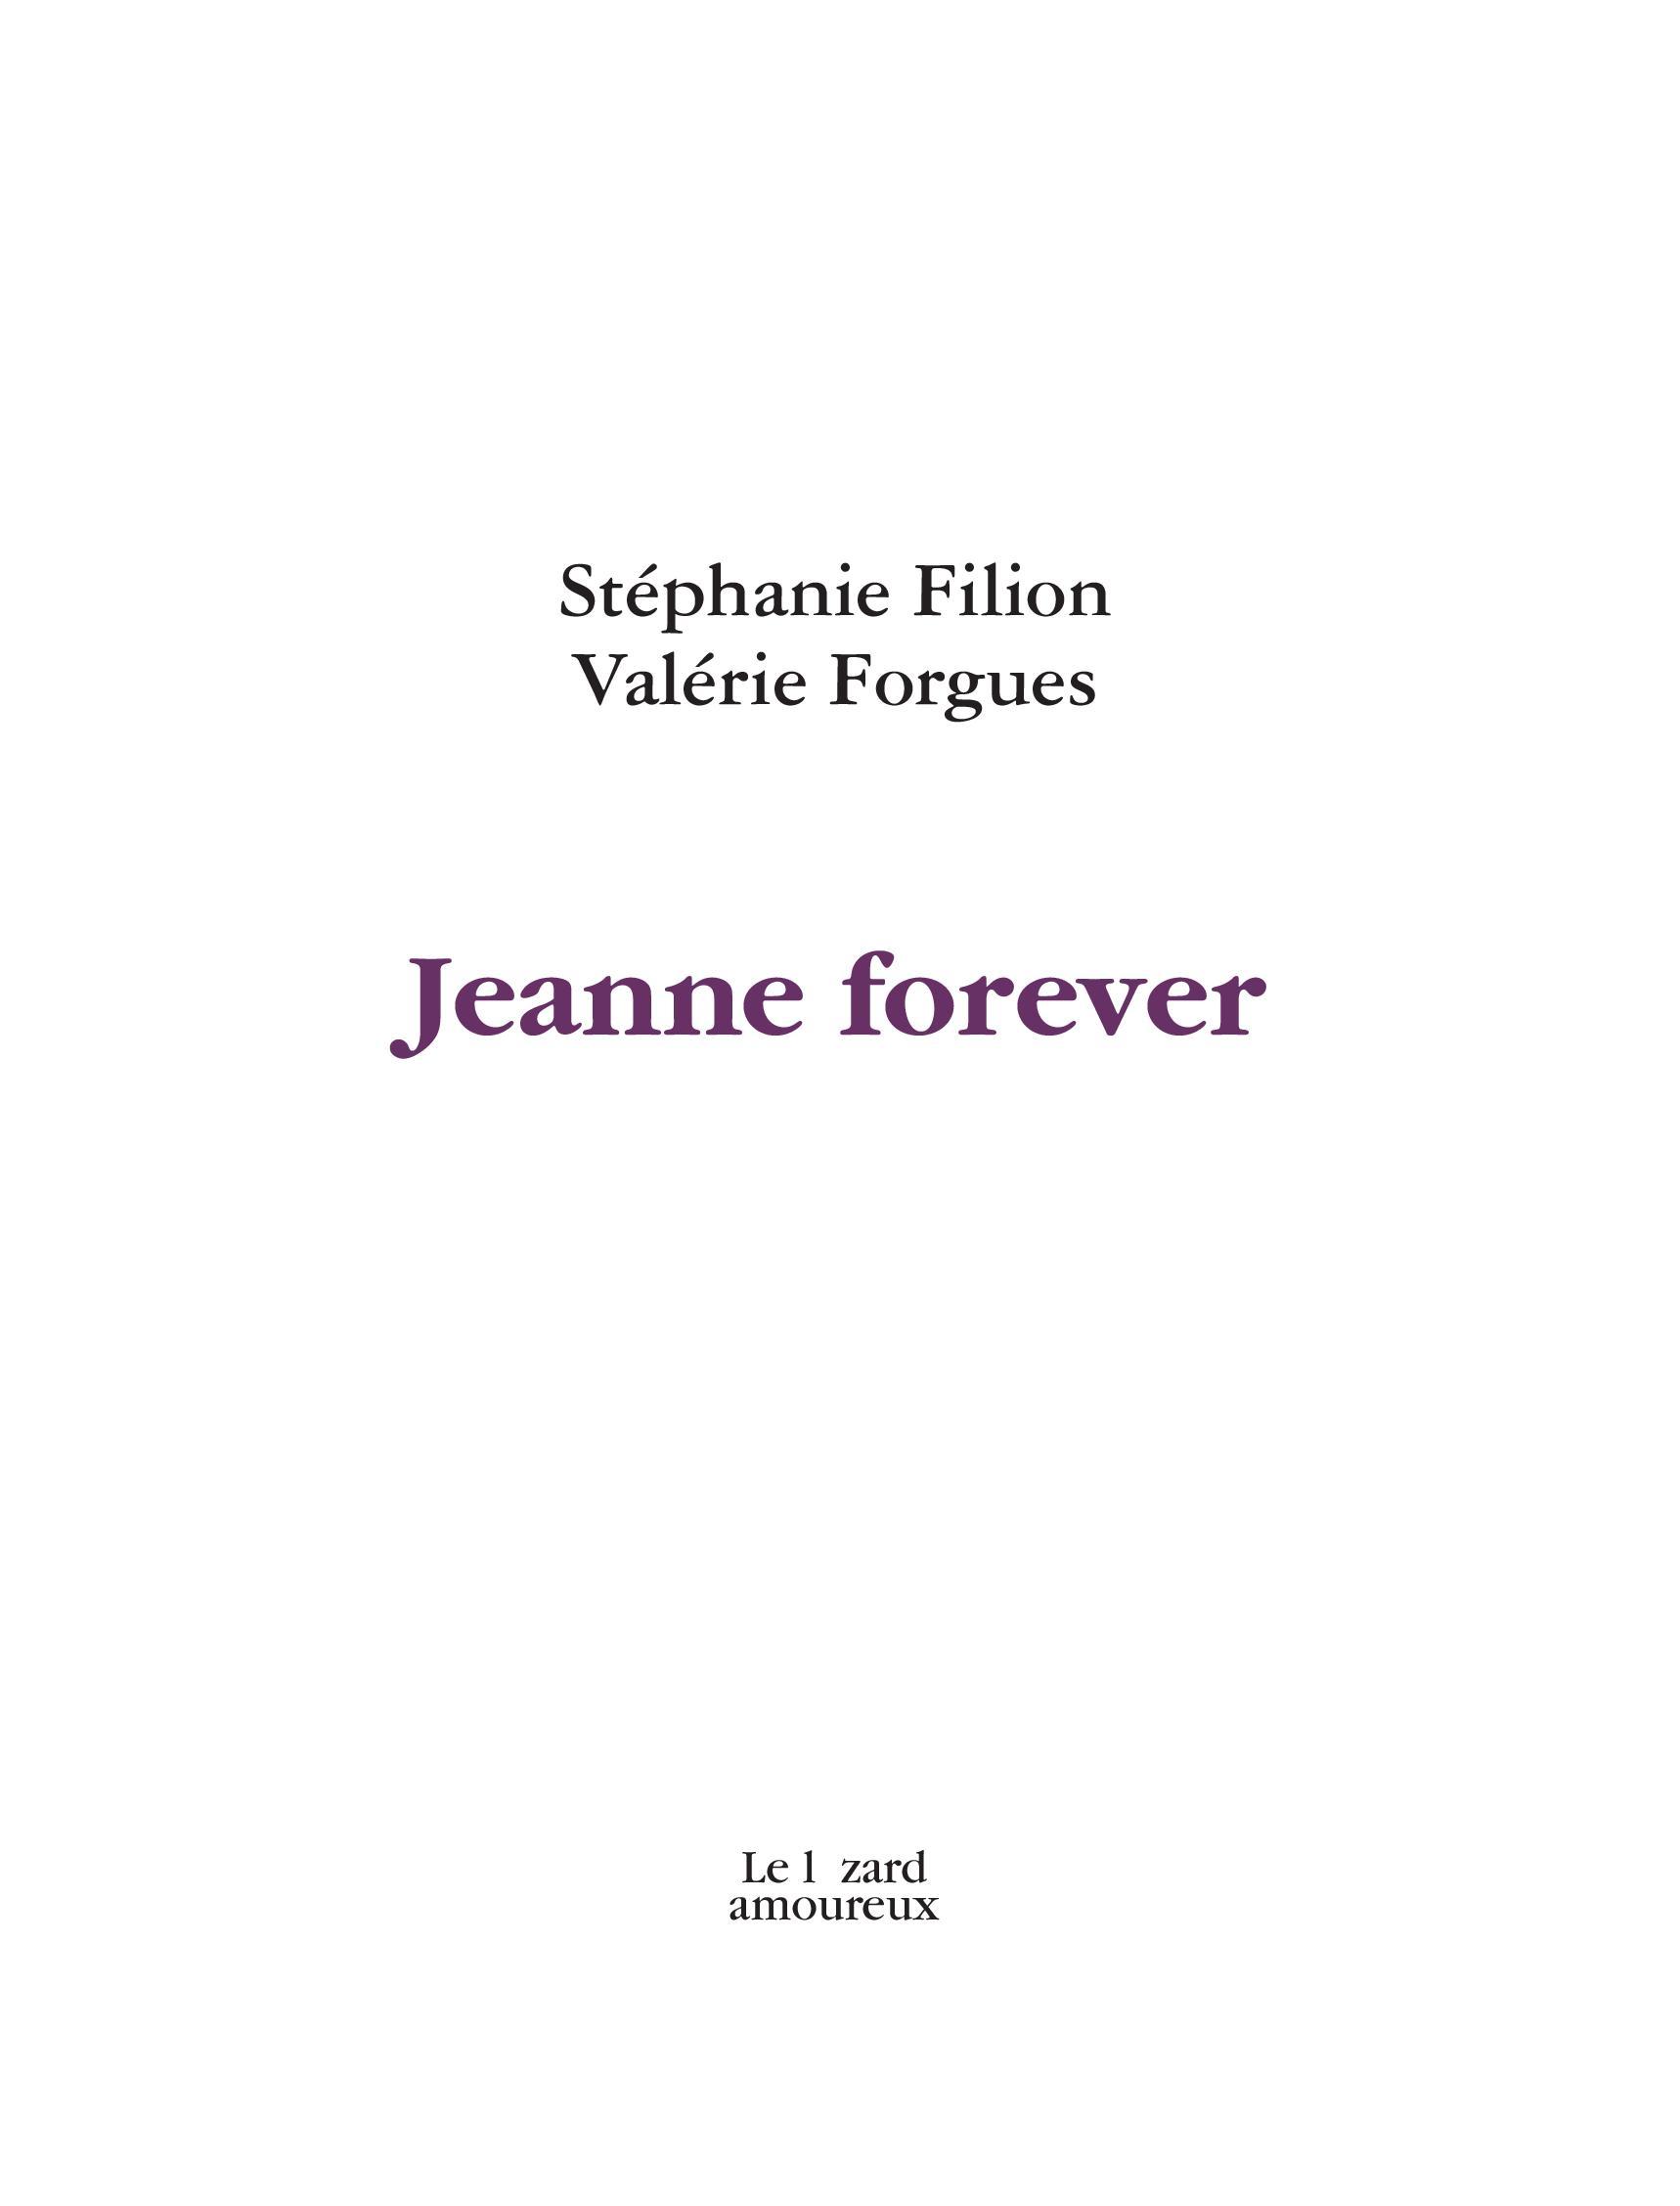 Jeanne forever